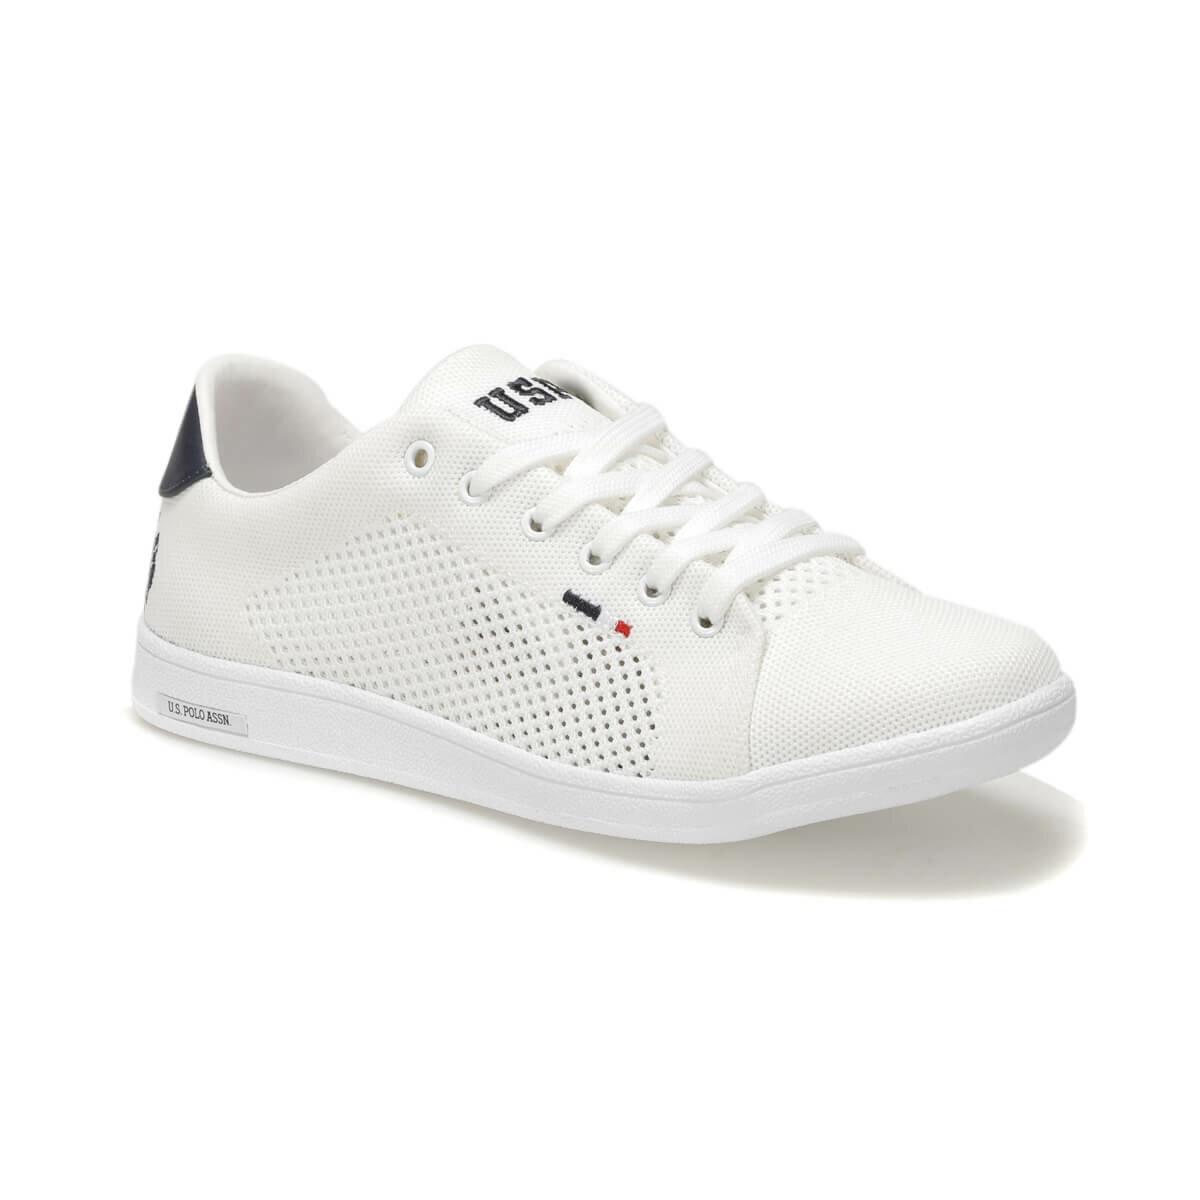 FLO FRANCO KNITTING White Men 'S Sneaker Shoes U.S. POLO ASSN.